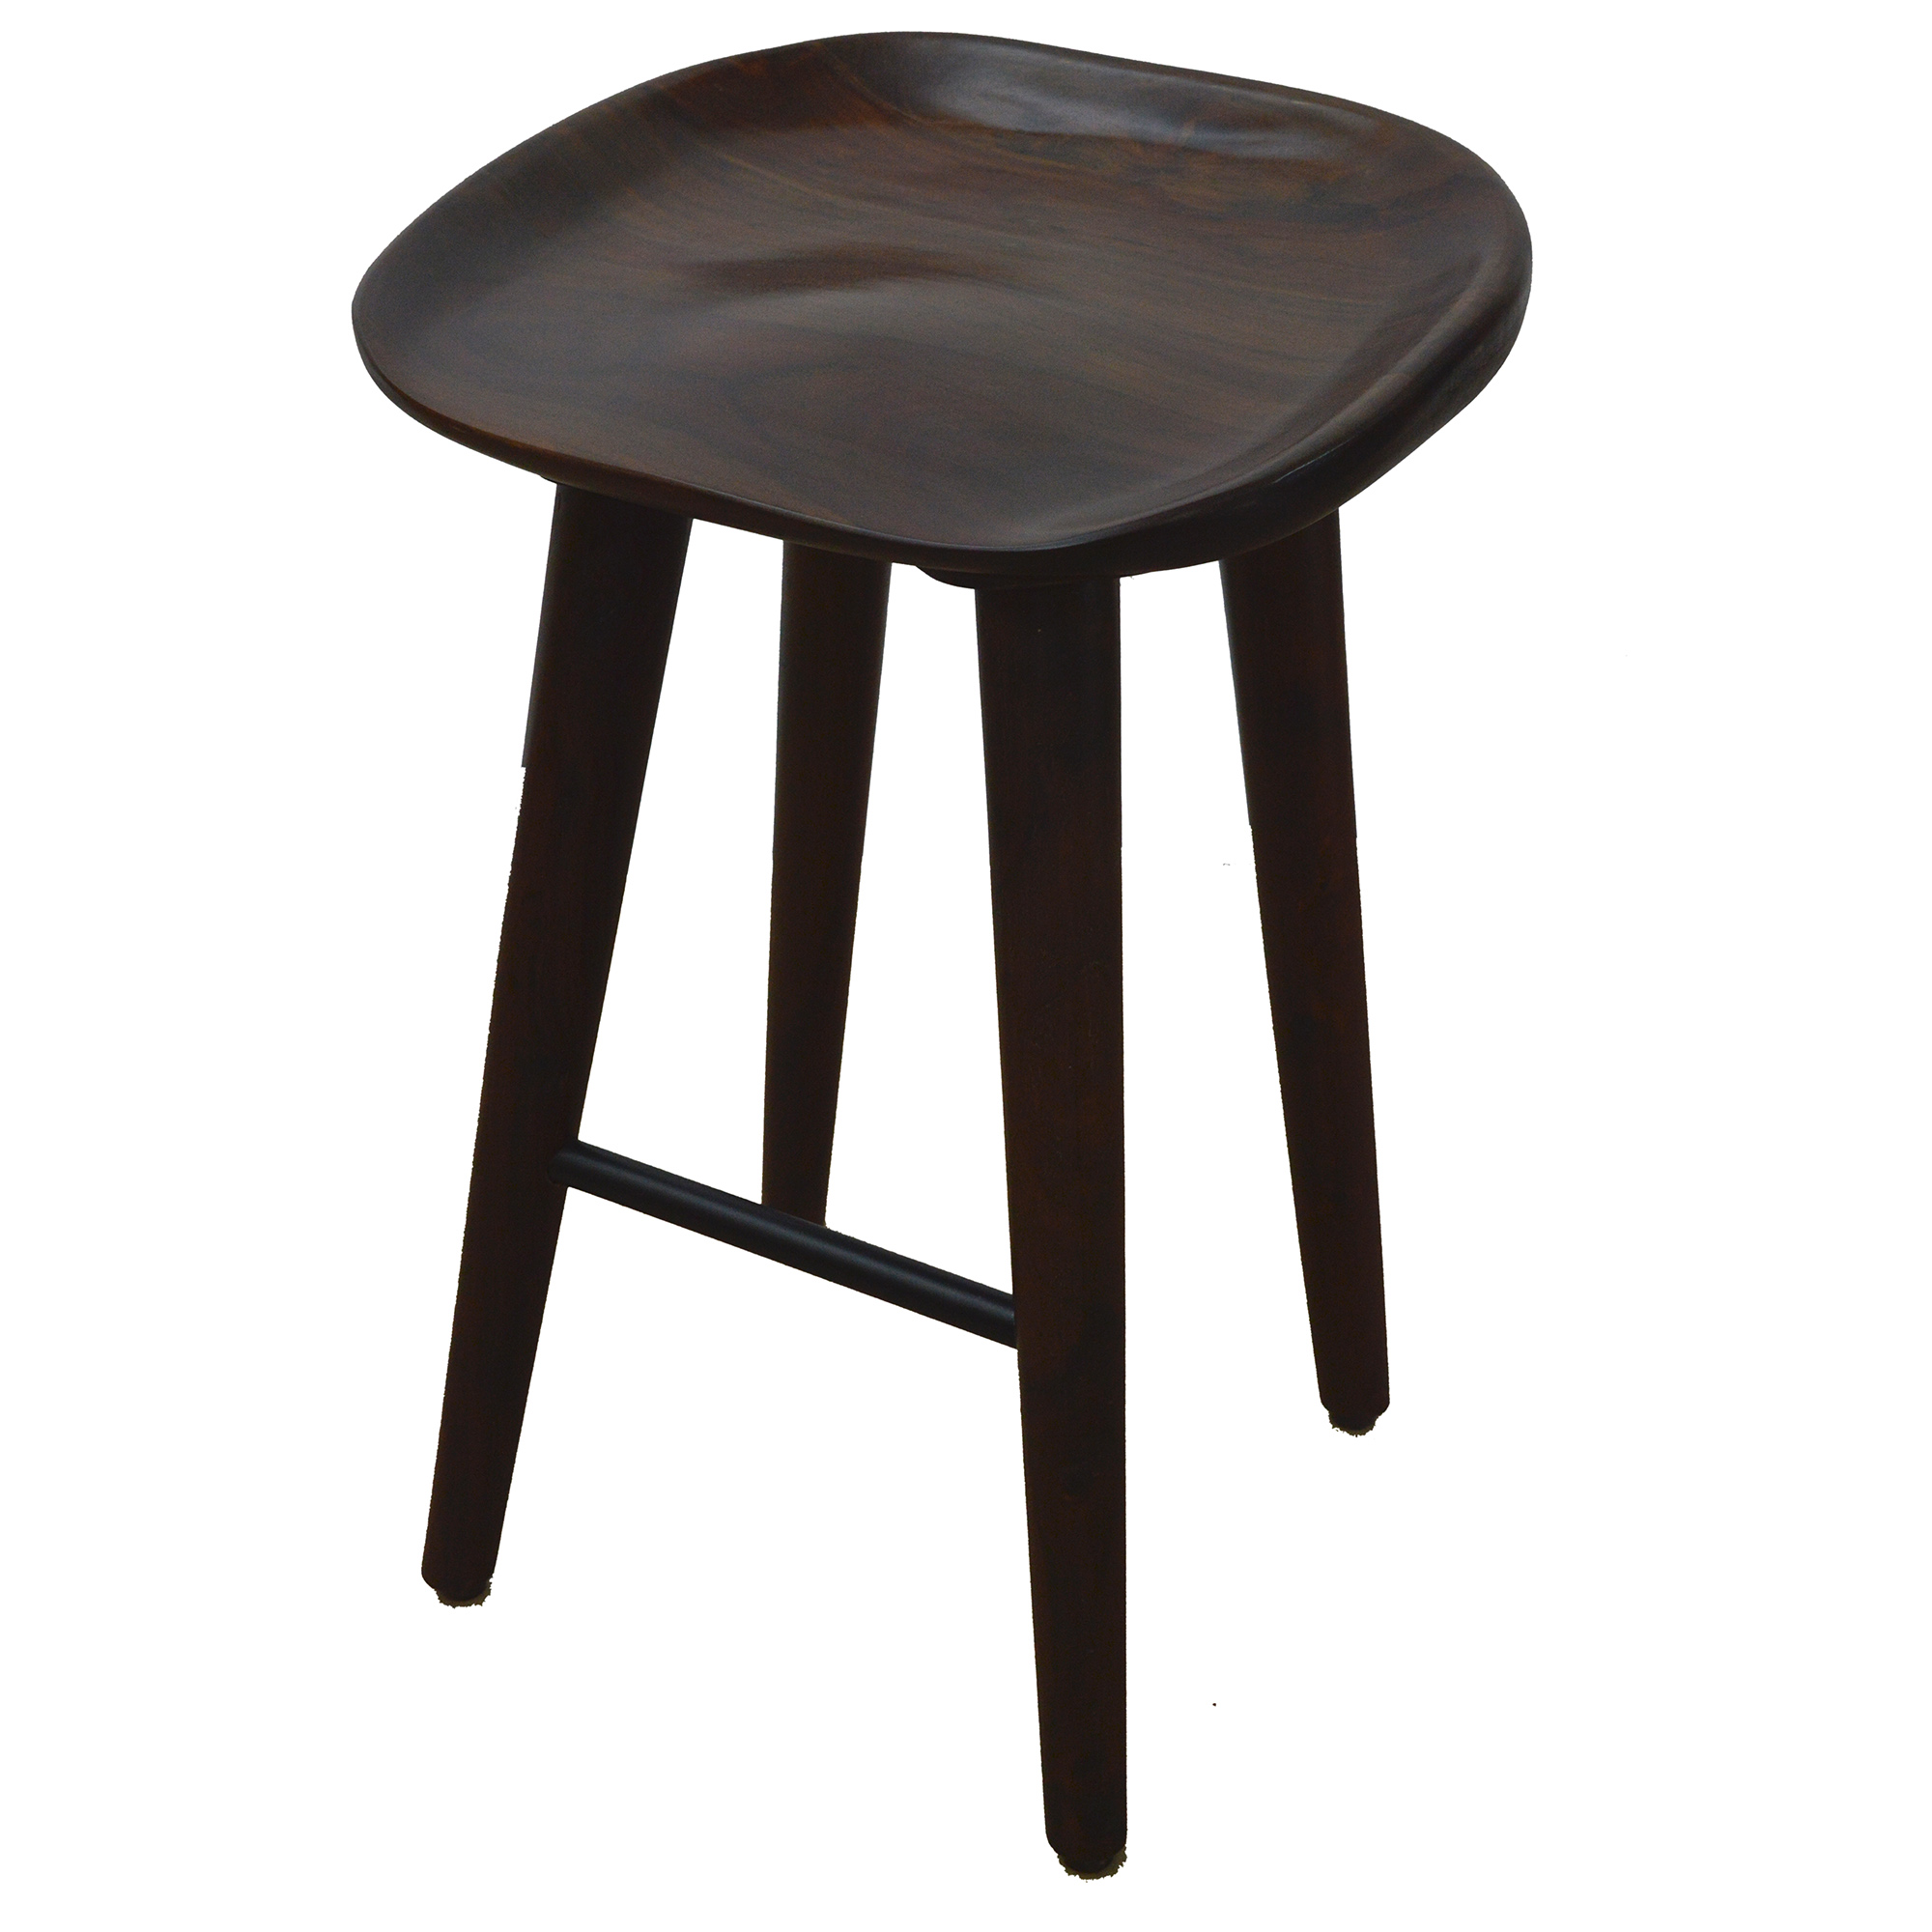 Kitchen Bar Stools Usa: Bar Stools & Kitchen Counter Stools :: RW-203-328